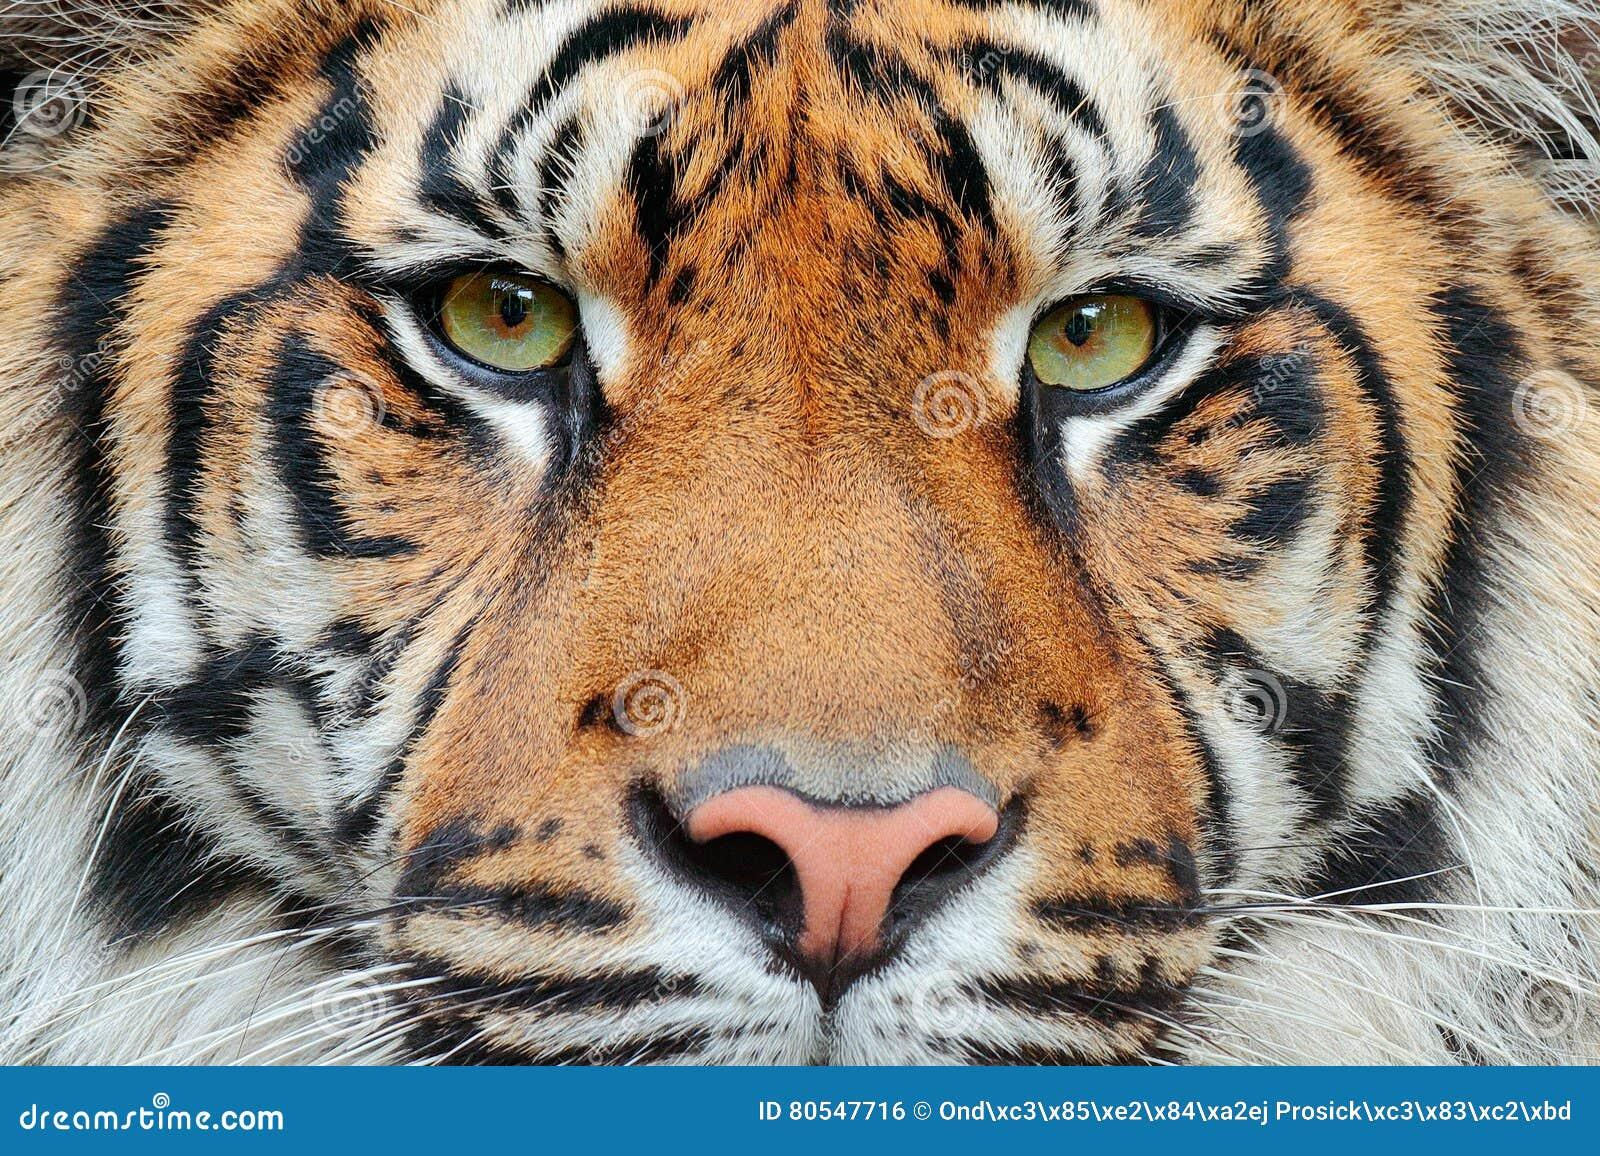 Close-up detail portrait of tiger. Sumatran tiger, Panthera tigris sumatrae, rare tiger subspecies that inhabits the Indonesian is